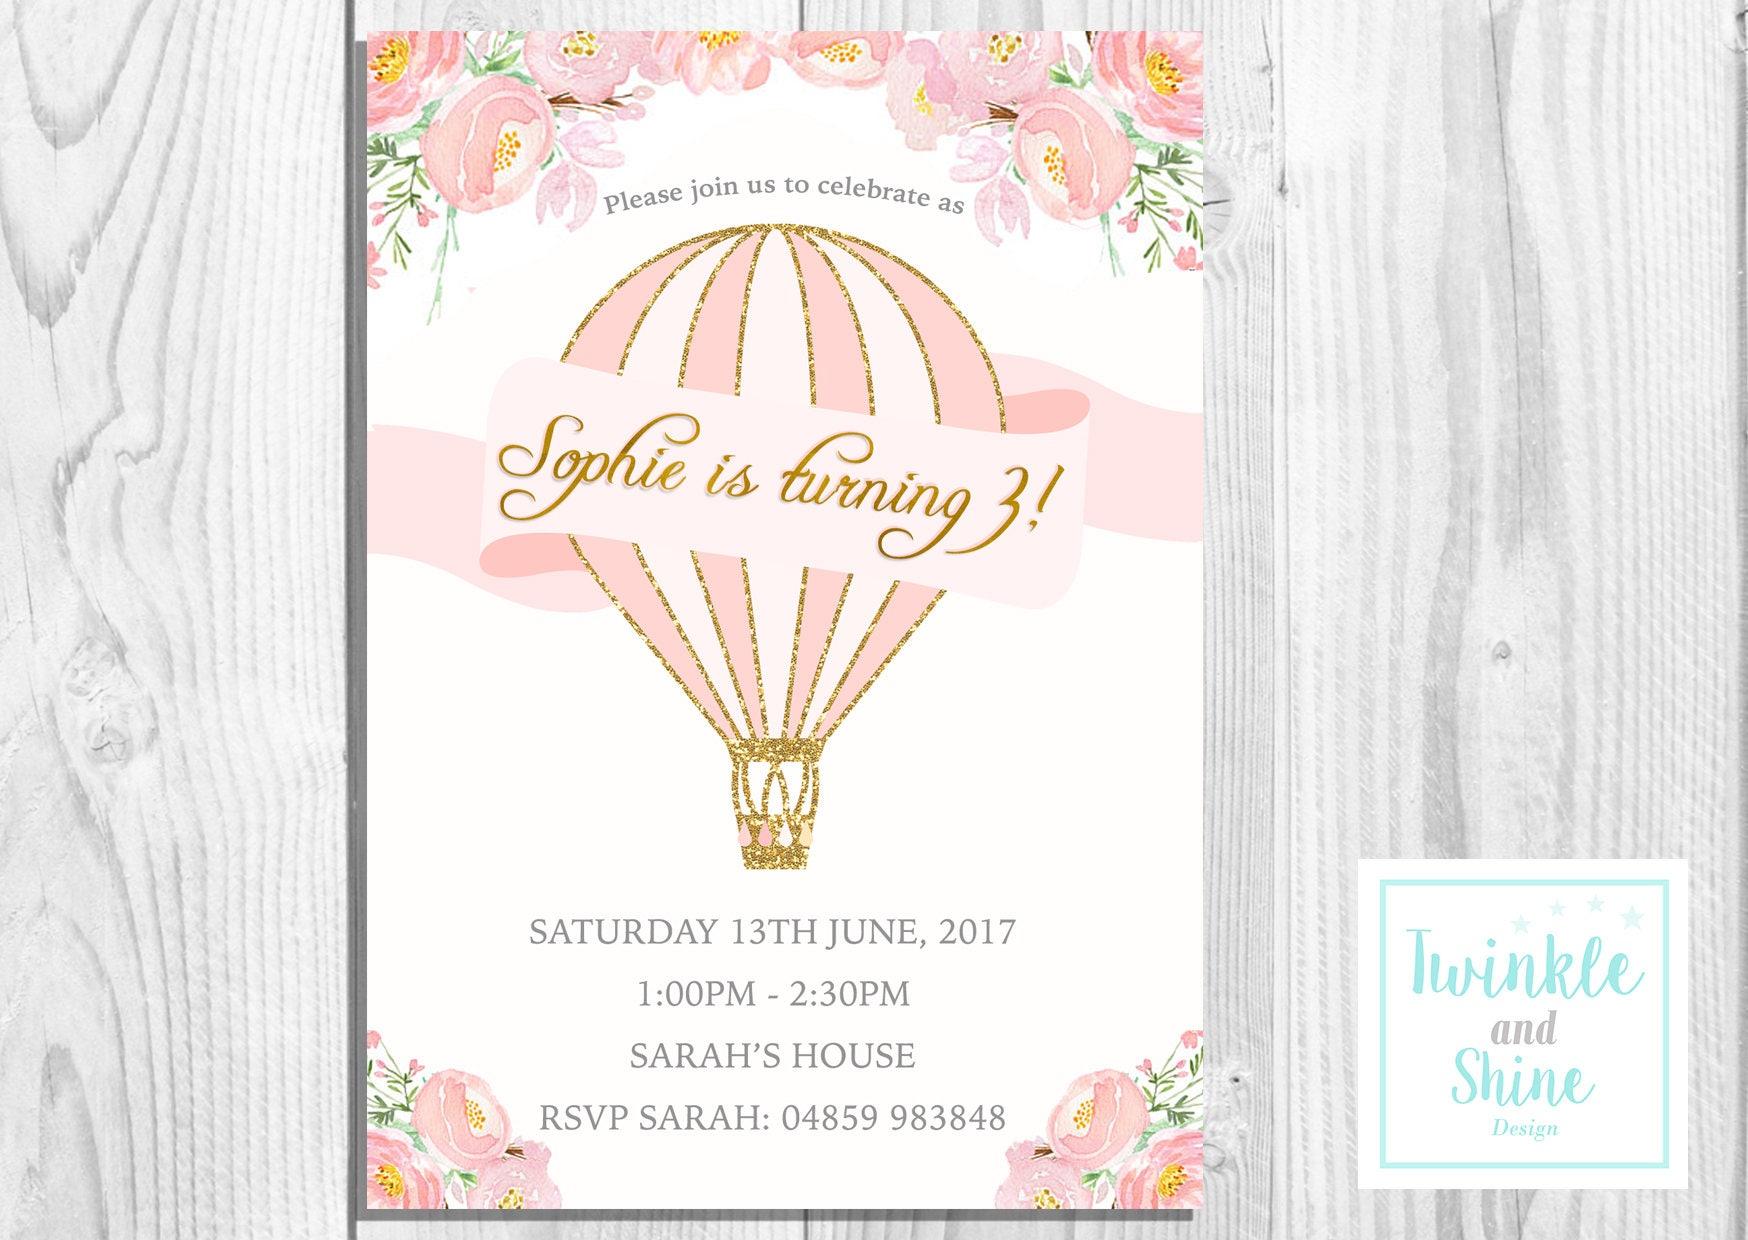 Printable Birthday Party Invitations, Pink, Hot Air Balloon, Cute ...